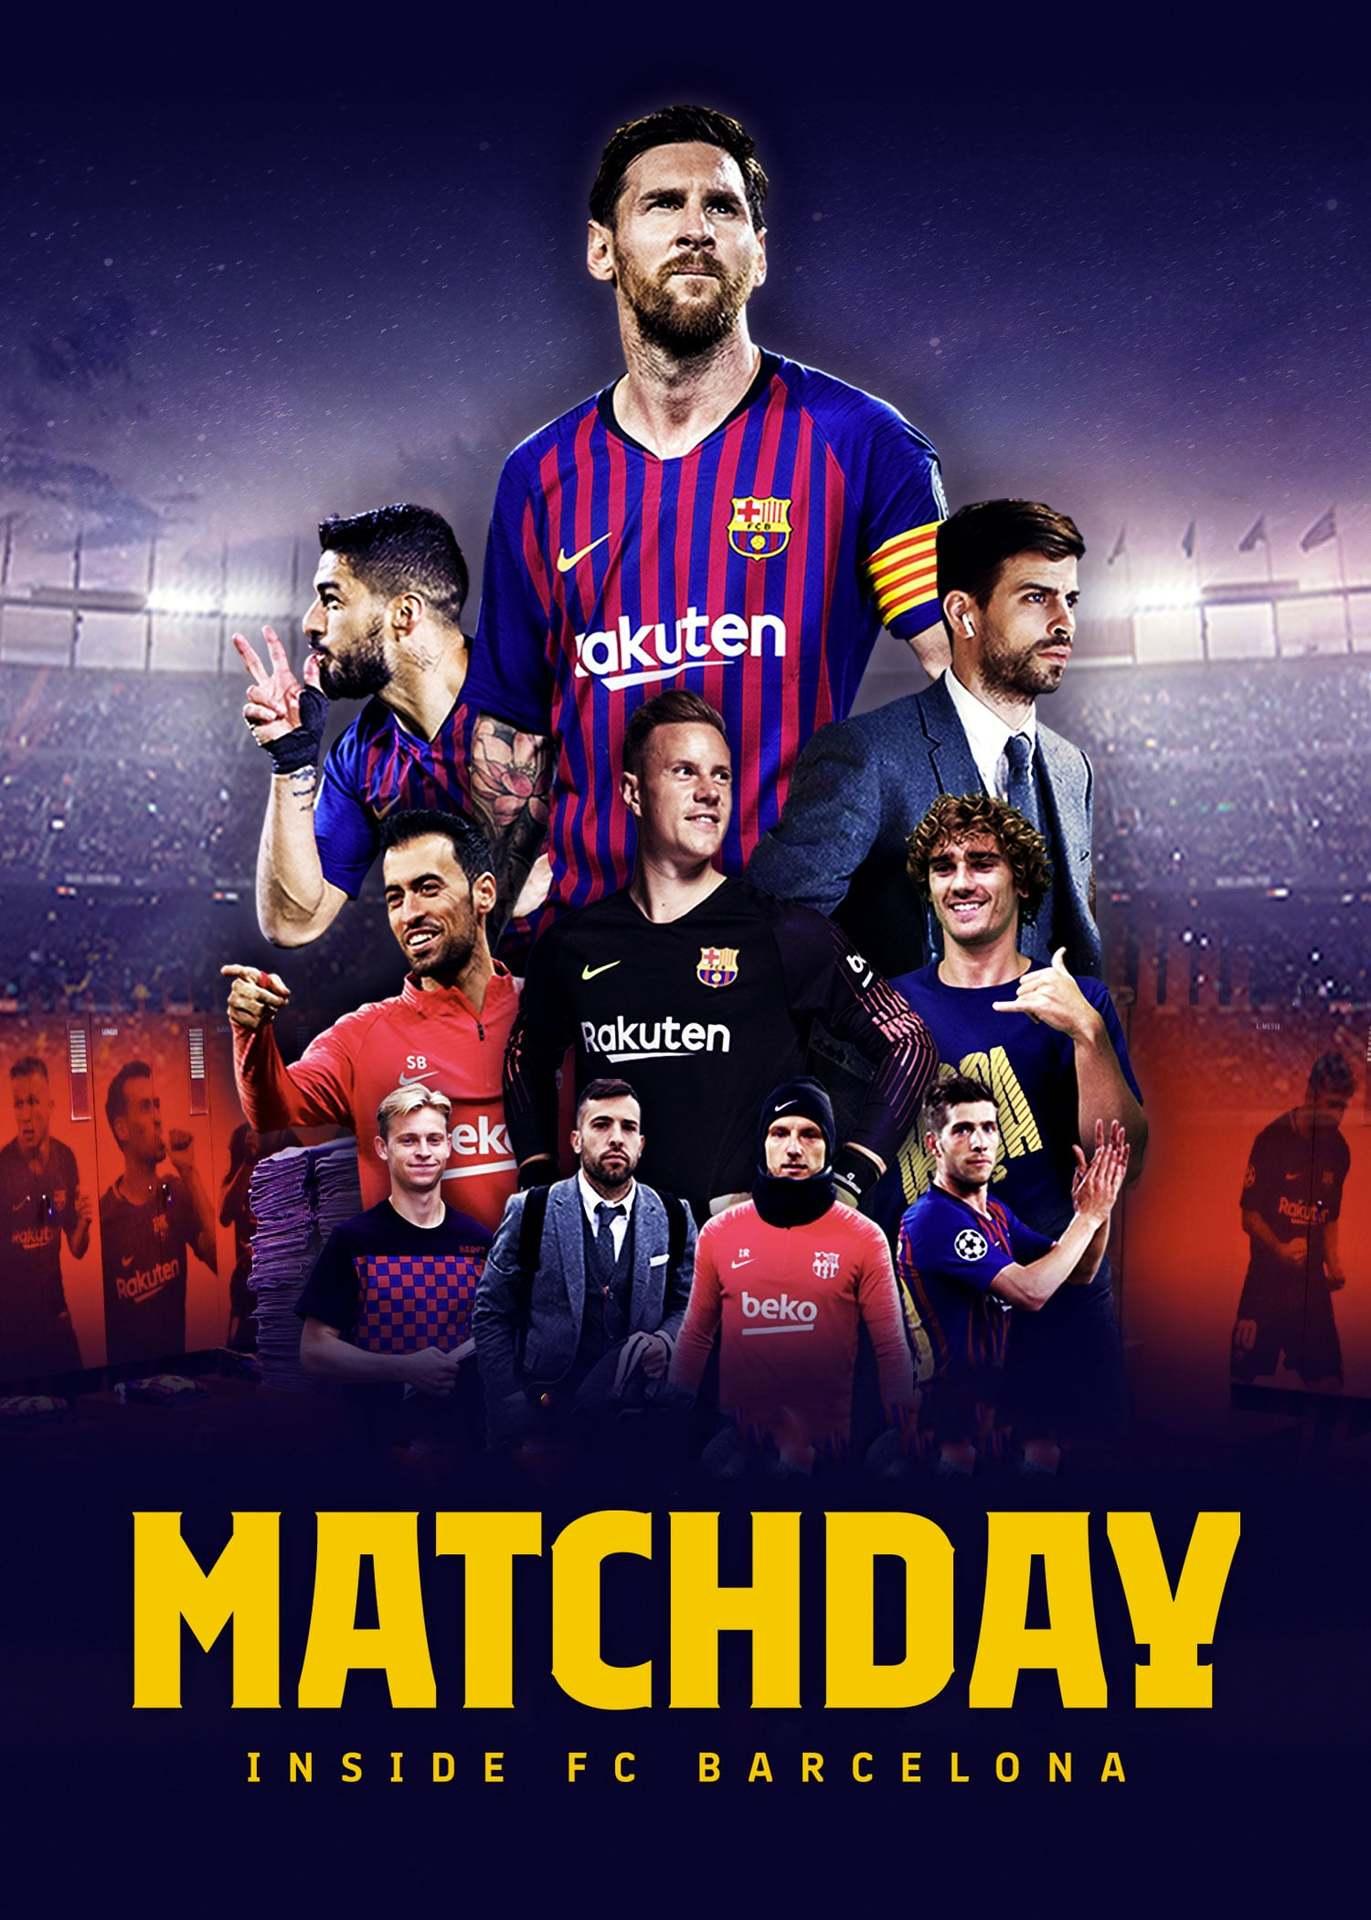 Постер фильма Matchday: Inside FC Barcelona 2019